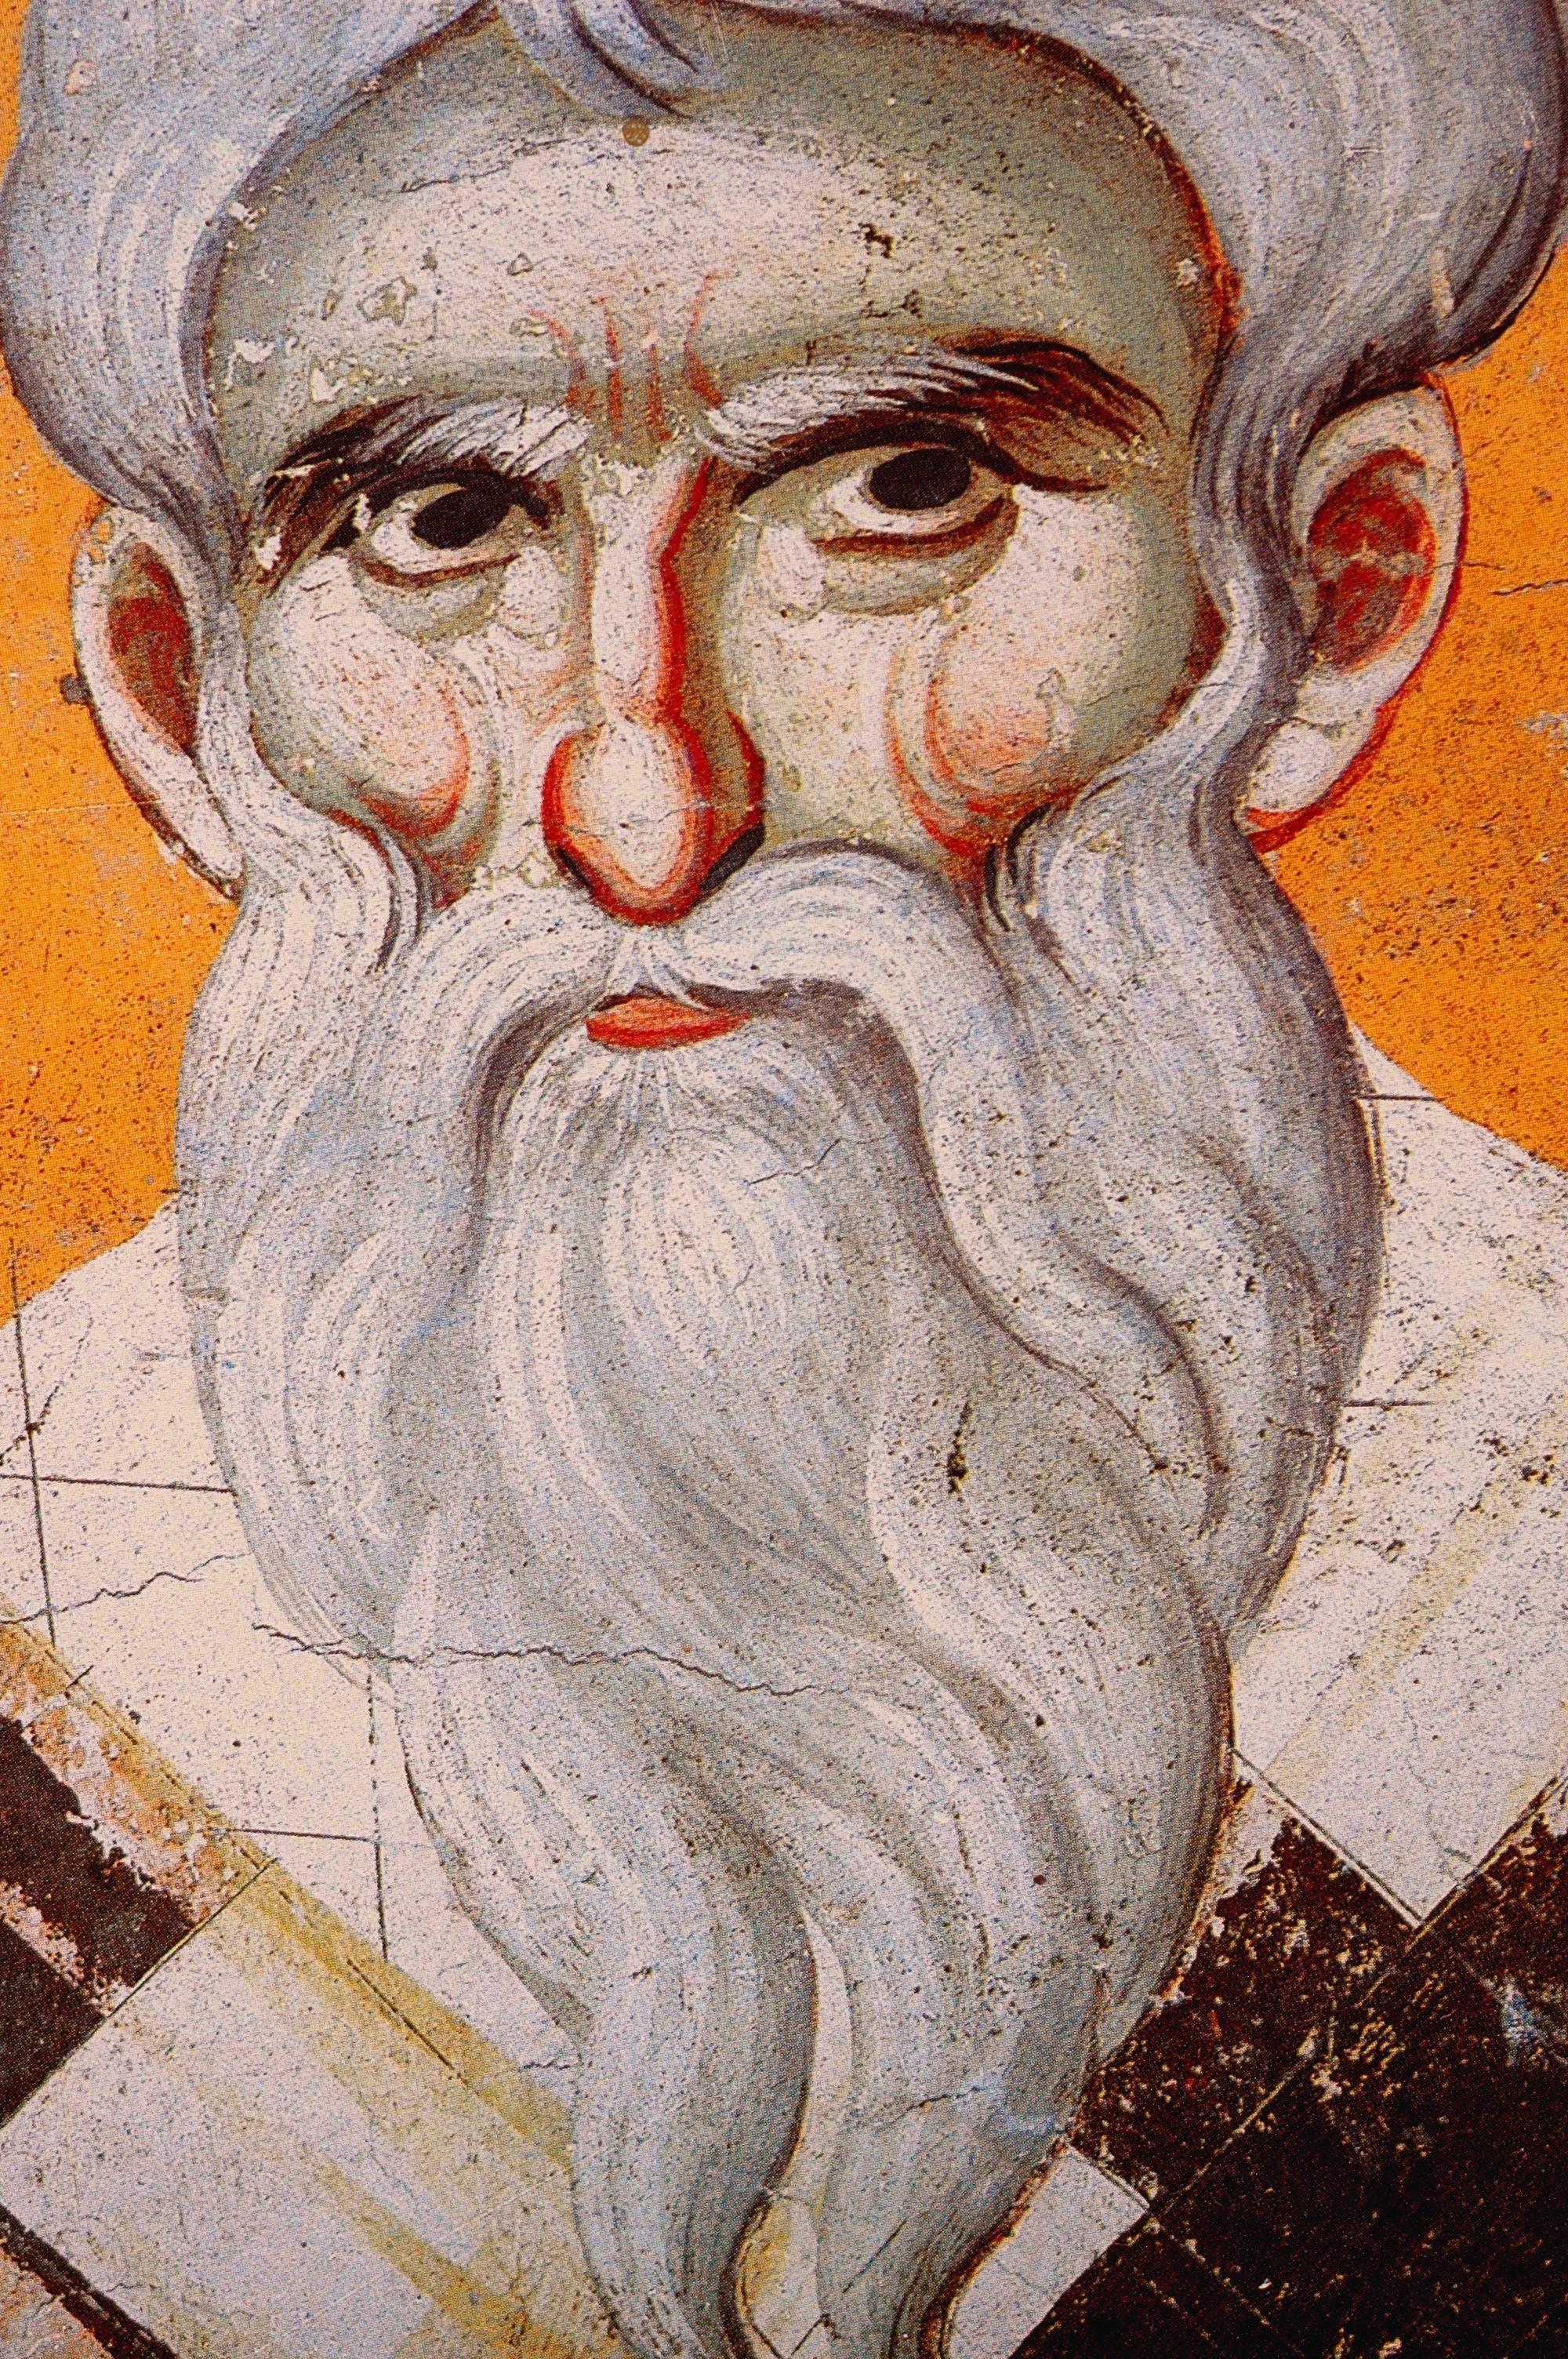 Священномученик Иерофей, Епископ Афинский. Фреска конца XIII века в монастыре Протат на Афоне. Иконописец Мануил Панселин.